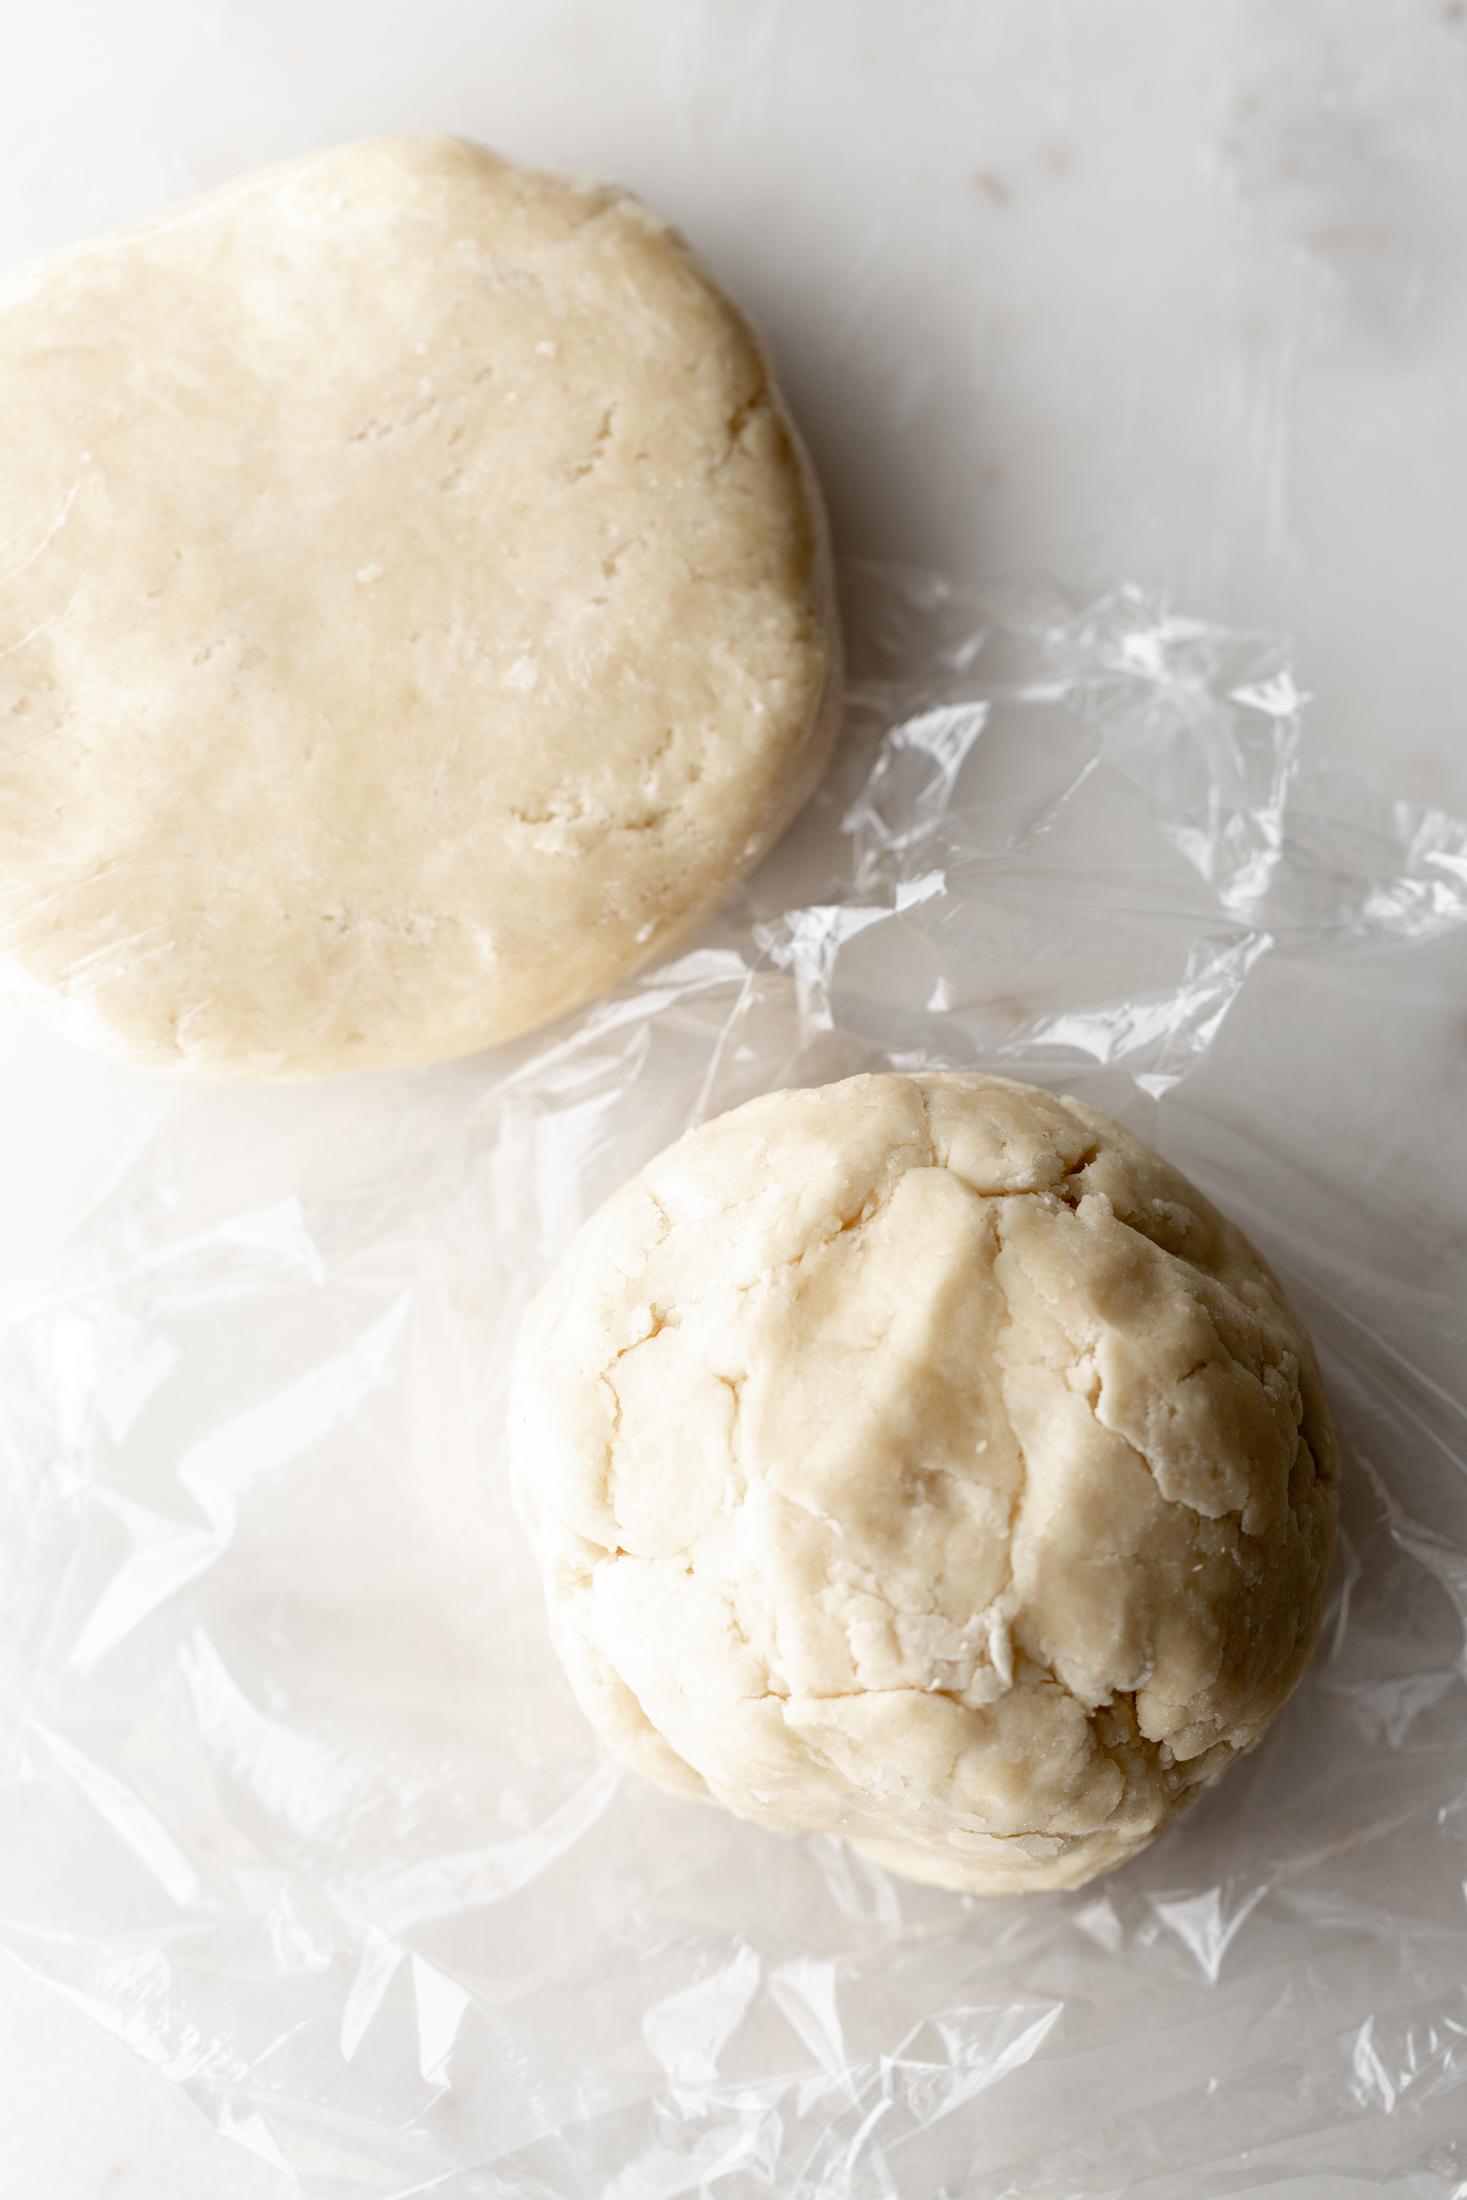 pie dough resting